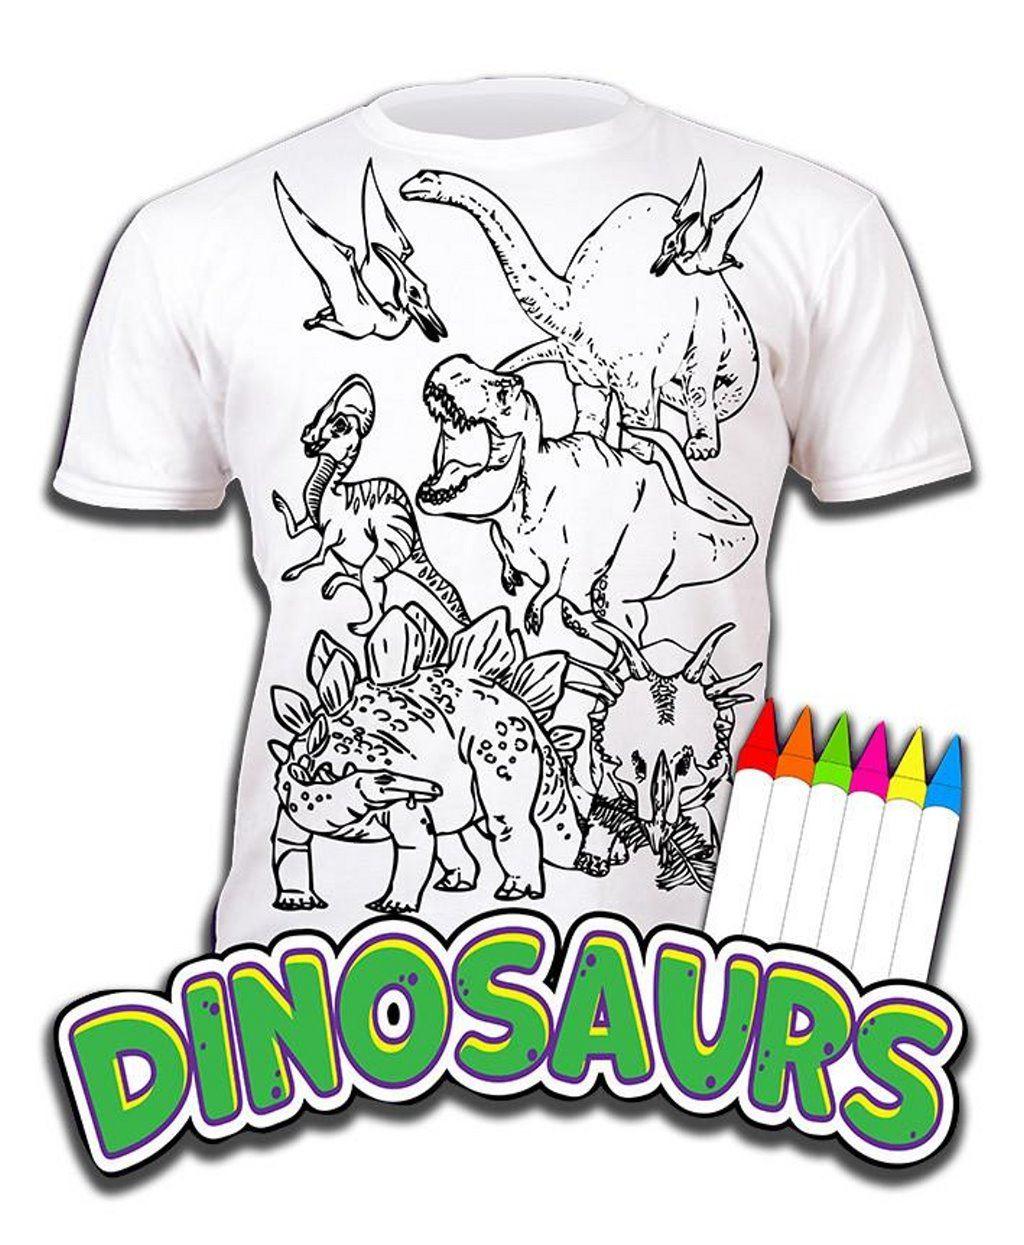 Colour-your-own-t-shirt-unicorn-mermaid-dinosaur-novelty-gift thumbnail 3